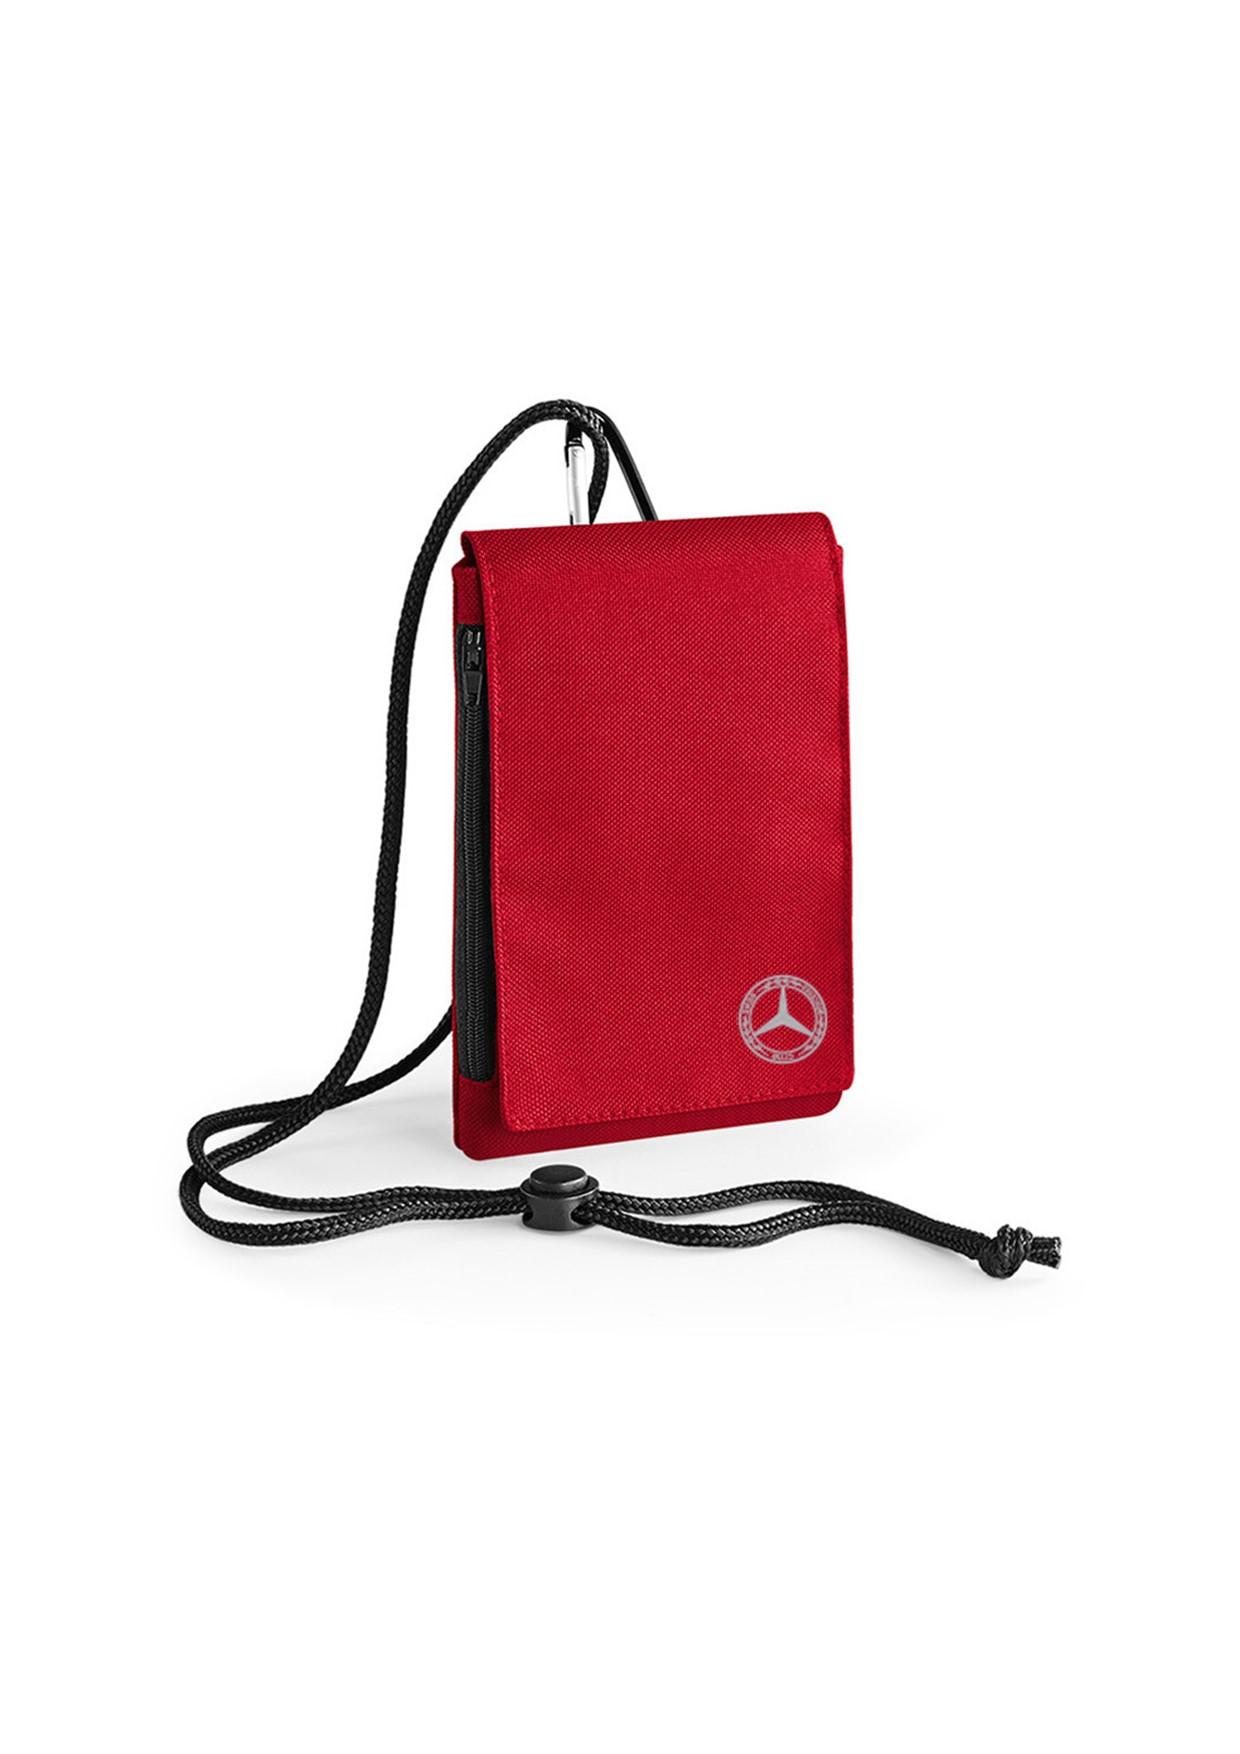 Mercedes-Benz Club XL Phone Bag